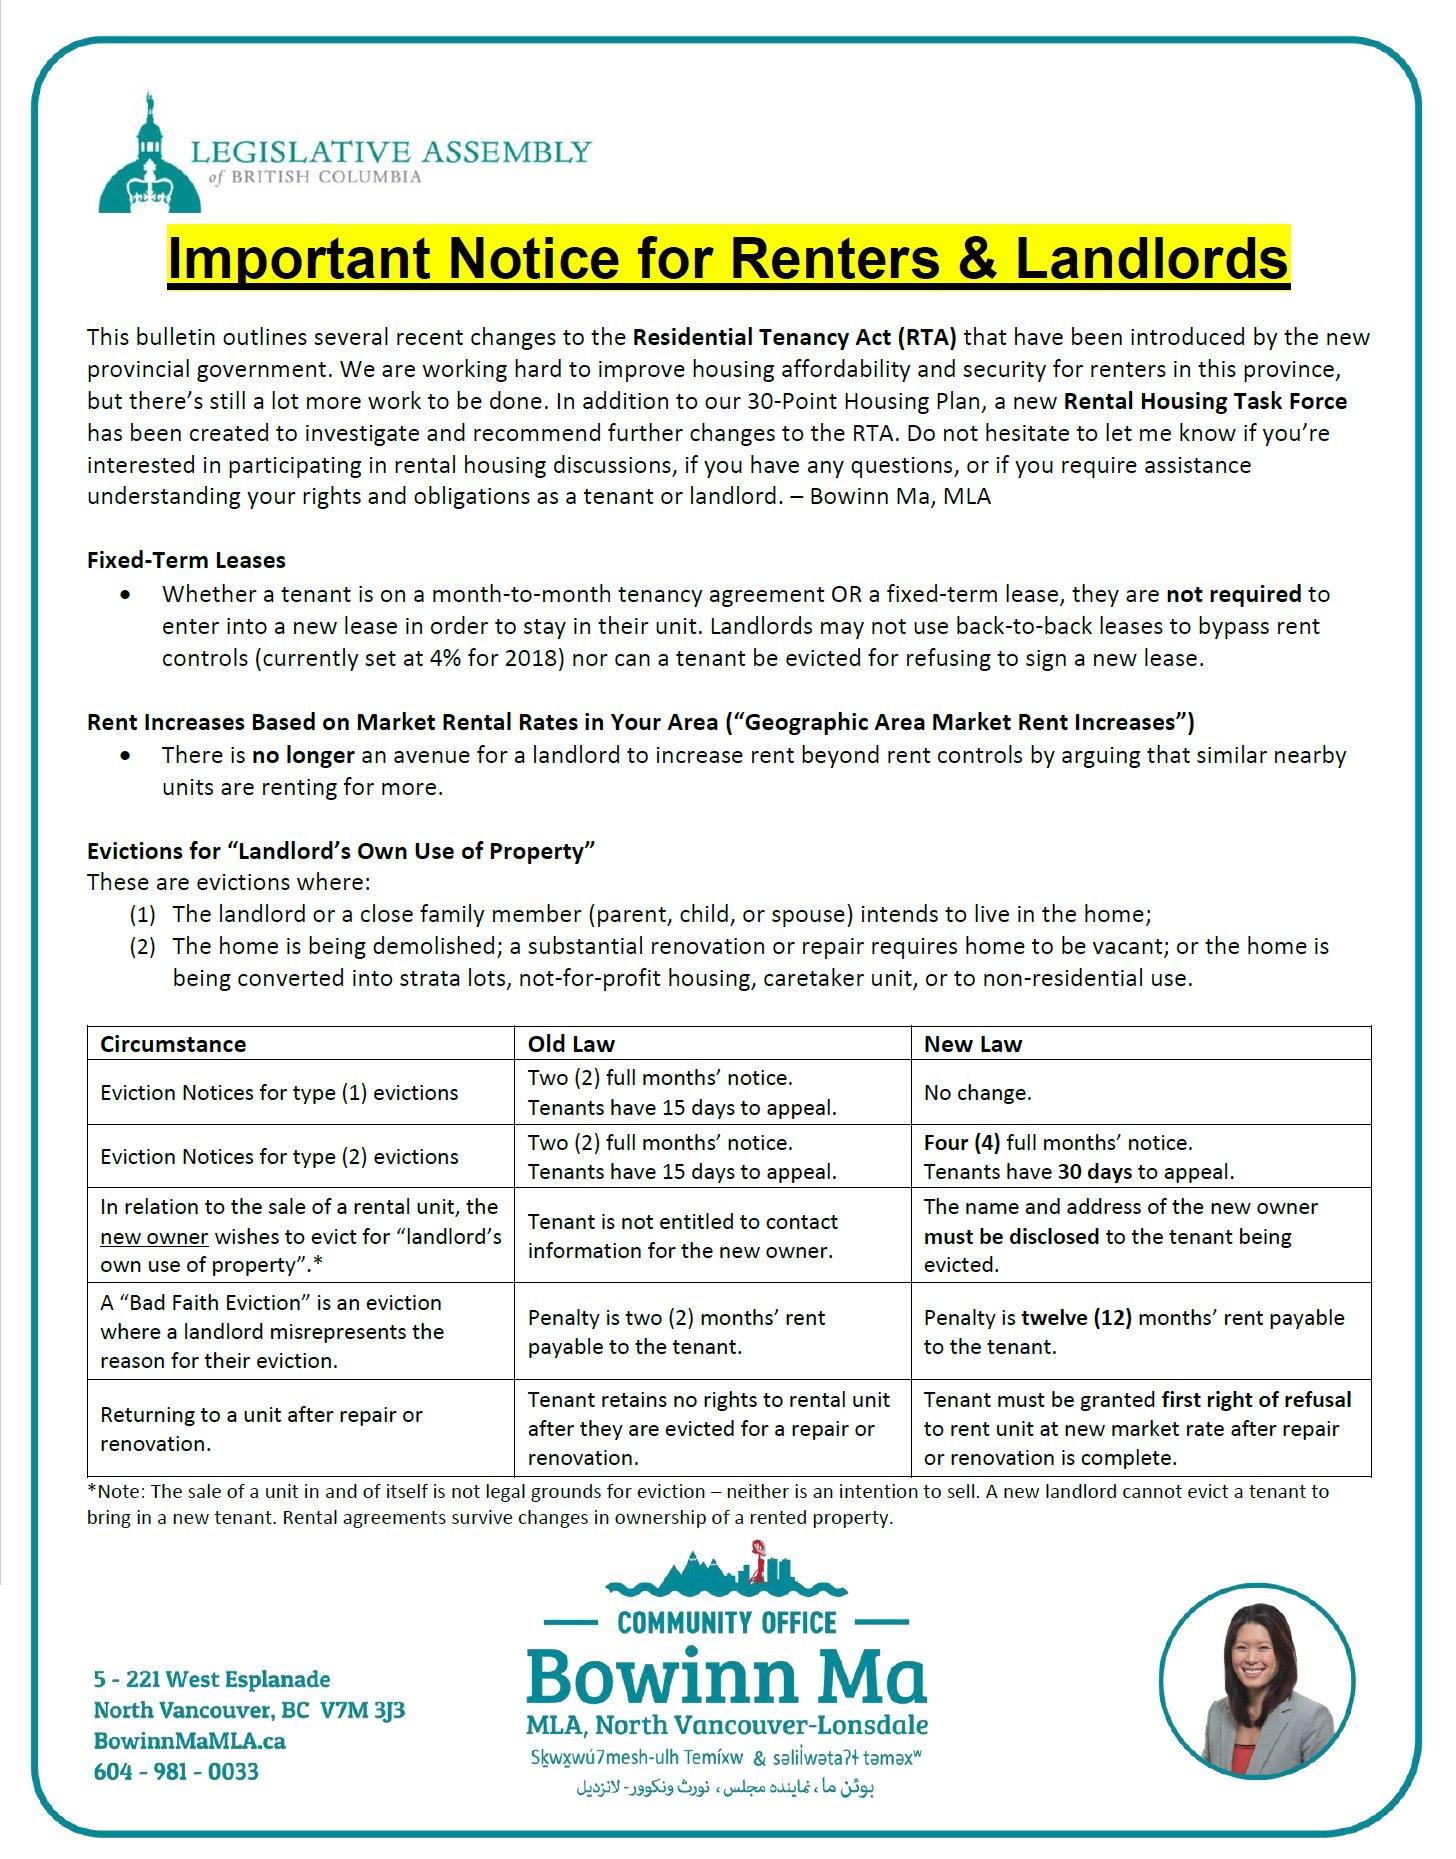 Bowinn Ma On Twitter Important Info For Renters Landlords